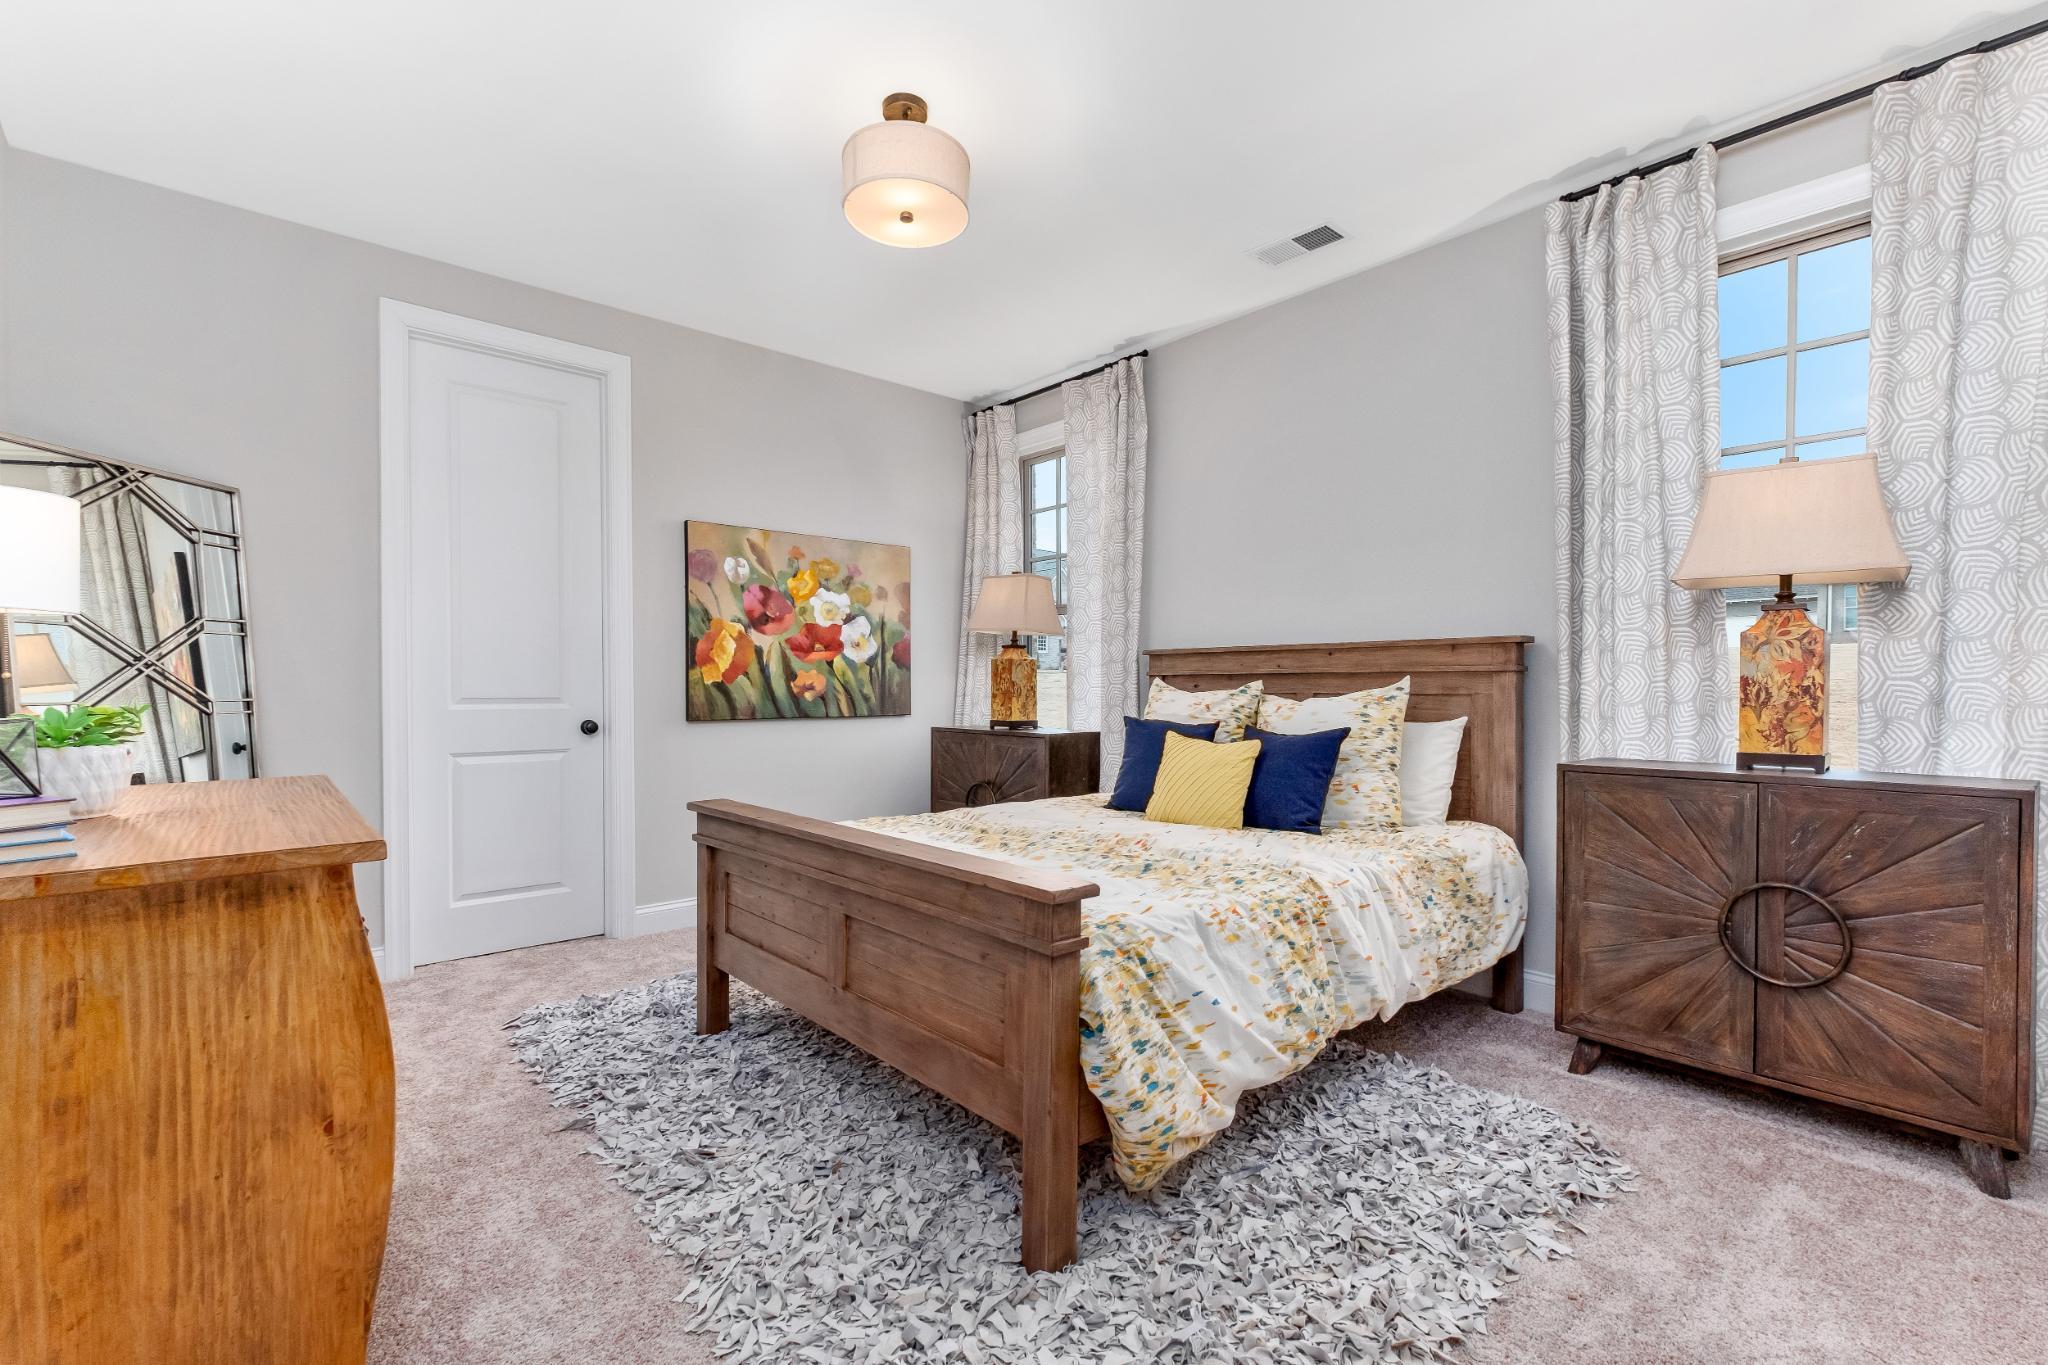 Bedroom featured in the Rosemont By Harris Doyle Homes Inc in Auburn-Opelika, AL